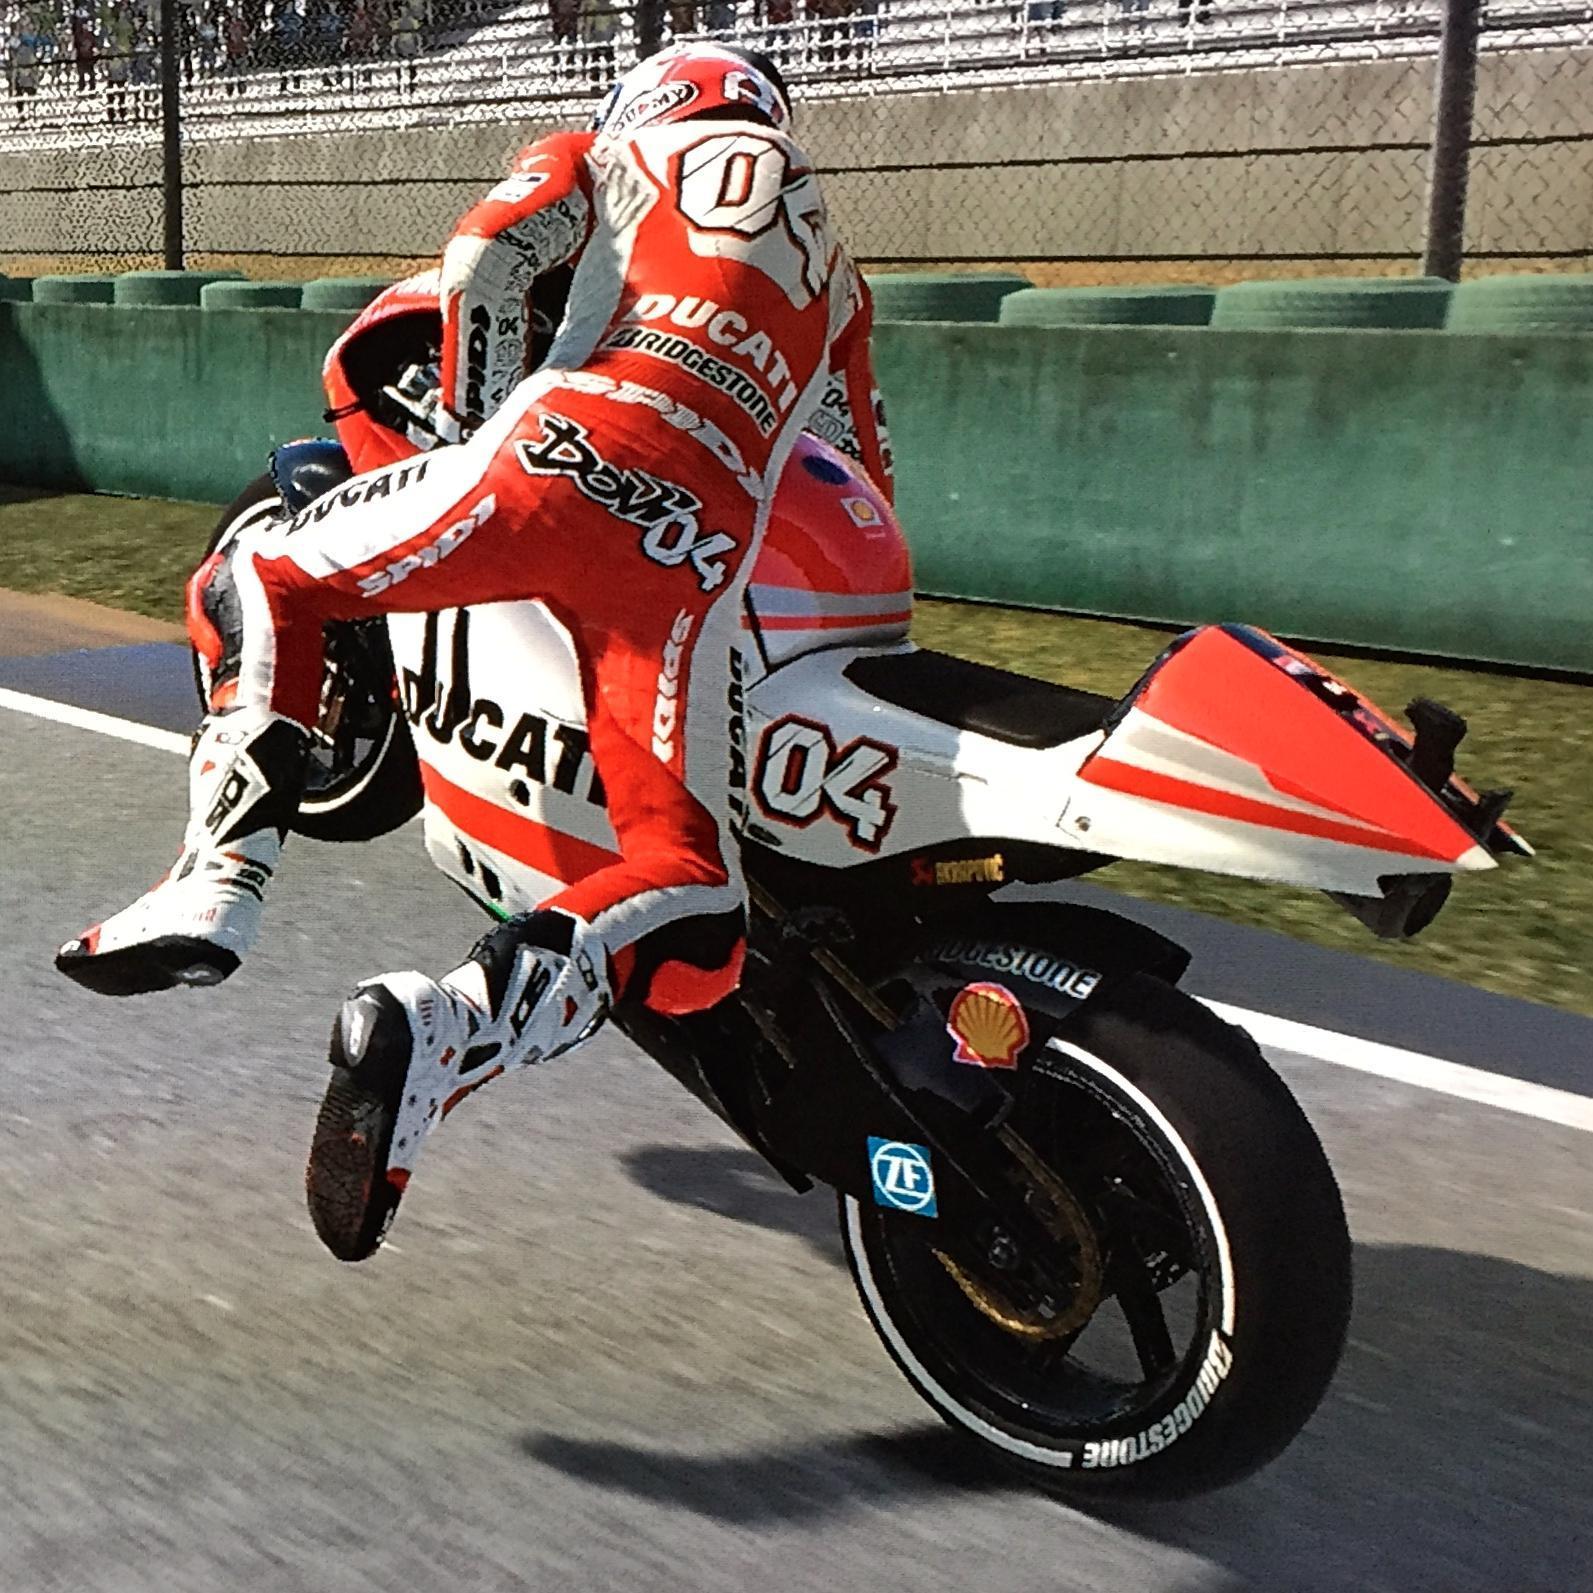 Armchair Racer On Twitter Quot Motogp 15 Ducati Desmosedici